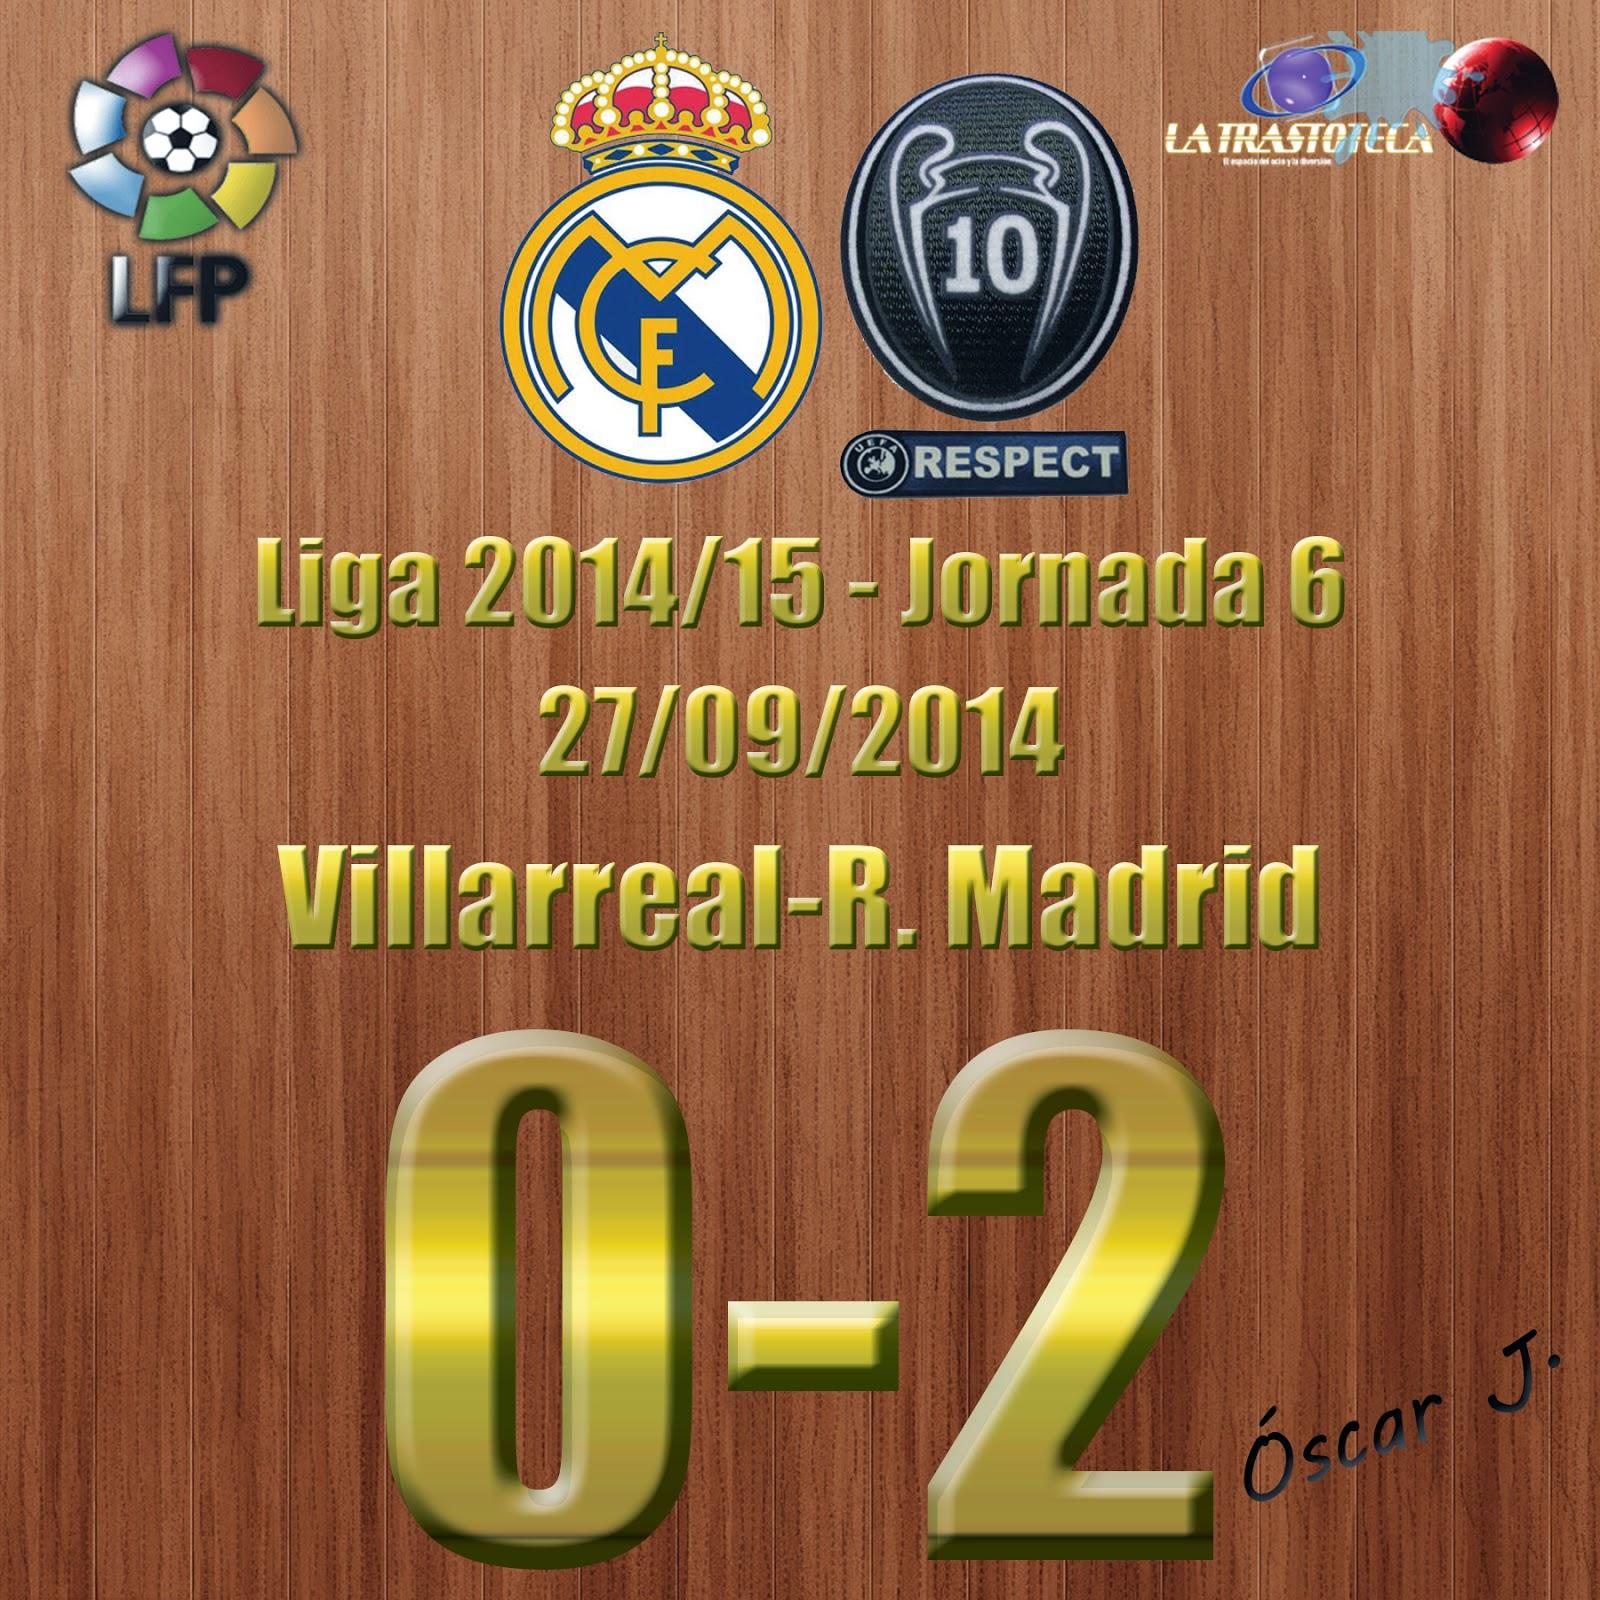 Villarreal 0-2 Real Madrid. Liga 2014/15 - Jornada 6.El Real Madrid golpea con fuerza en el Madrigal.